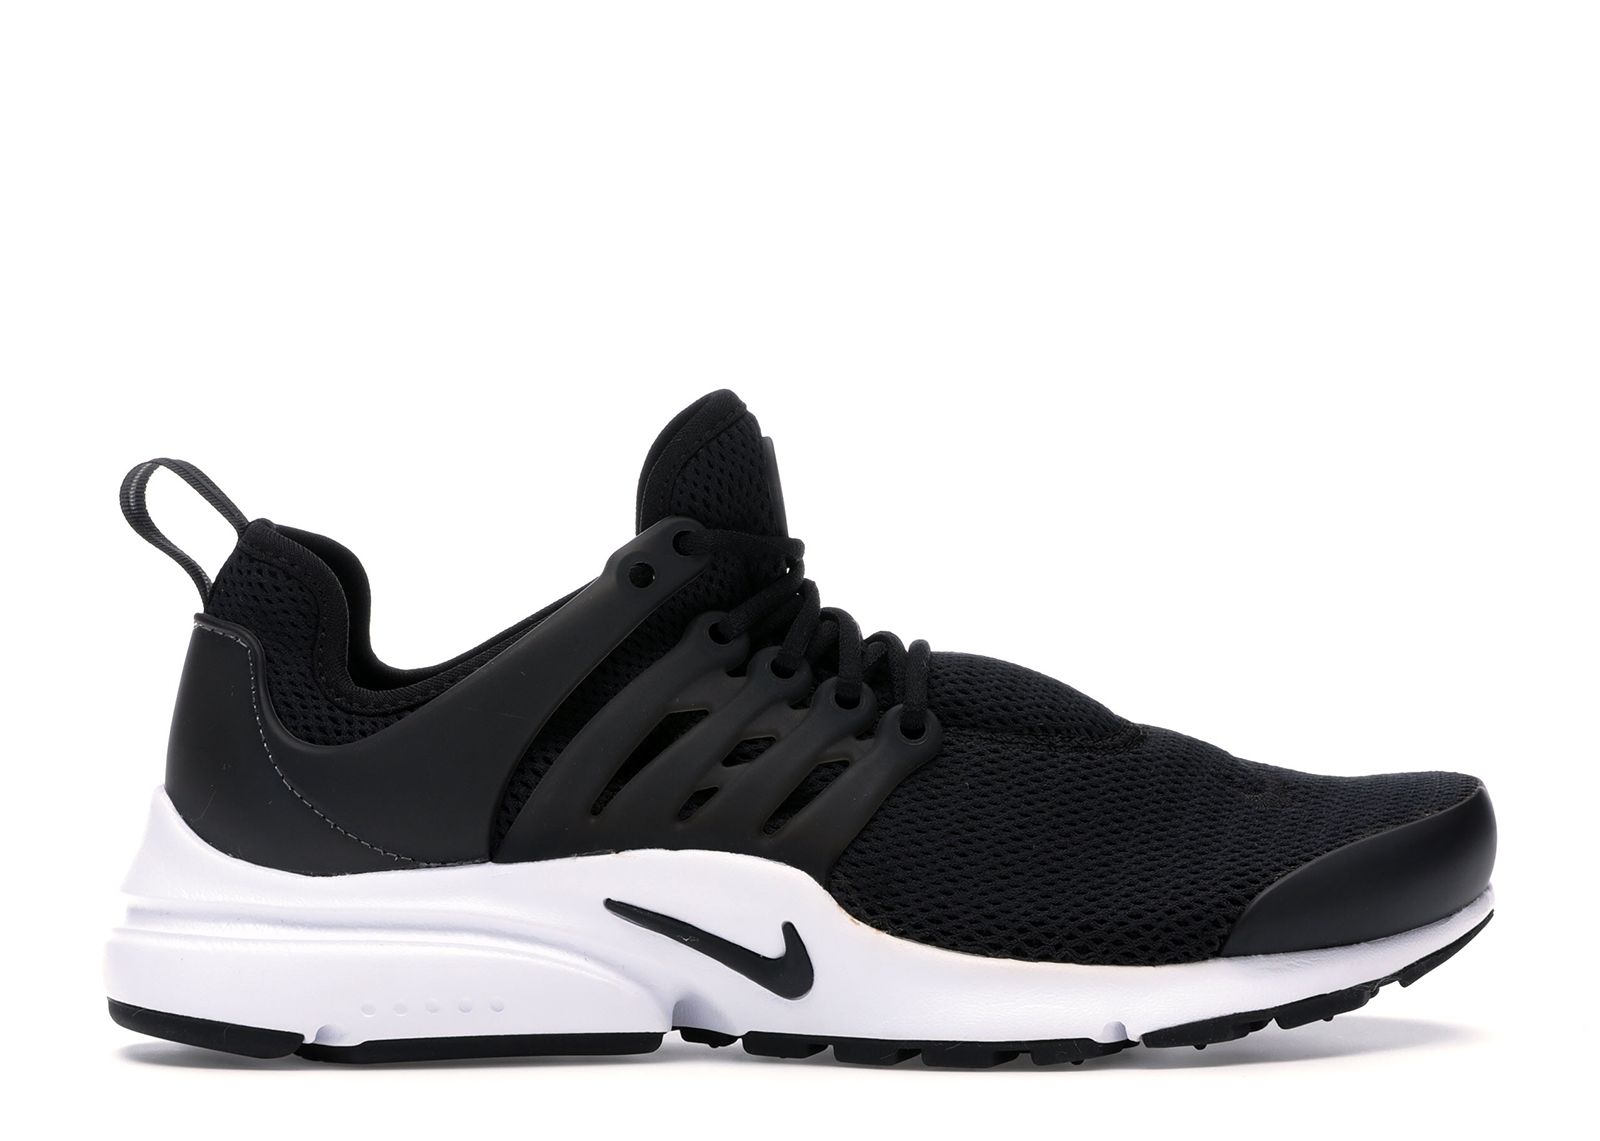 Nike Air Presto Black White (W)